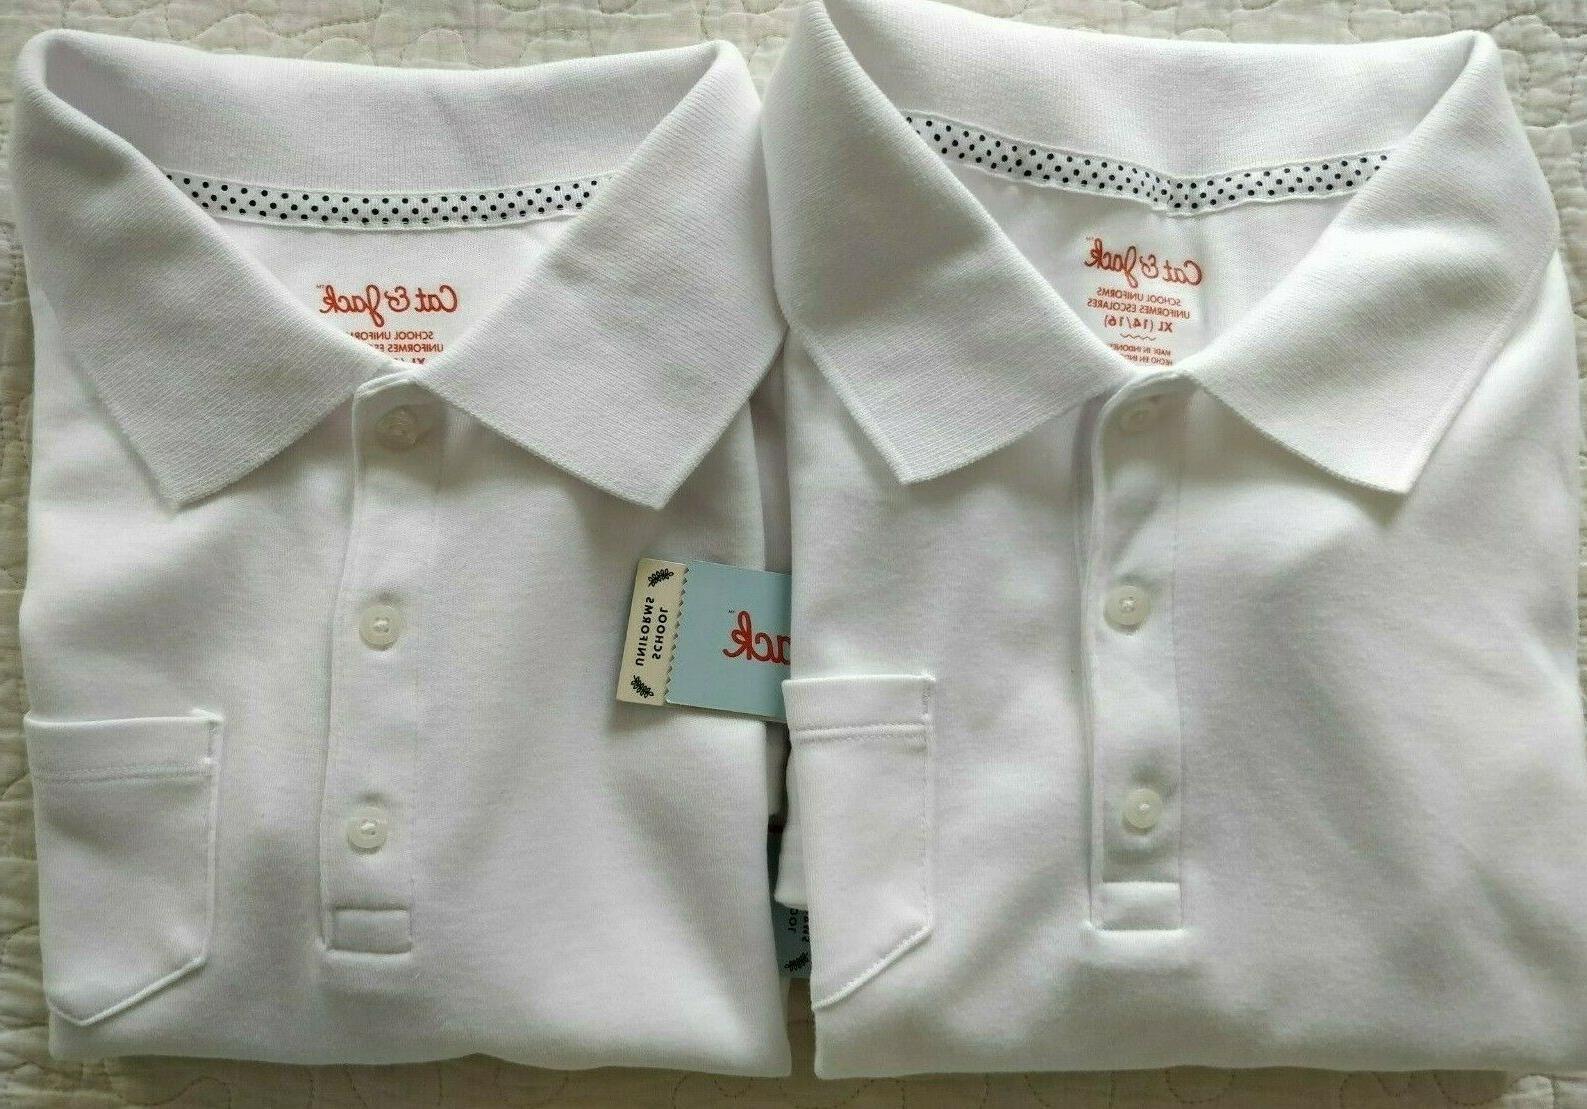 nwt lot of 2 girls uniform shirts